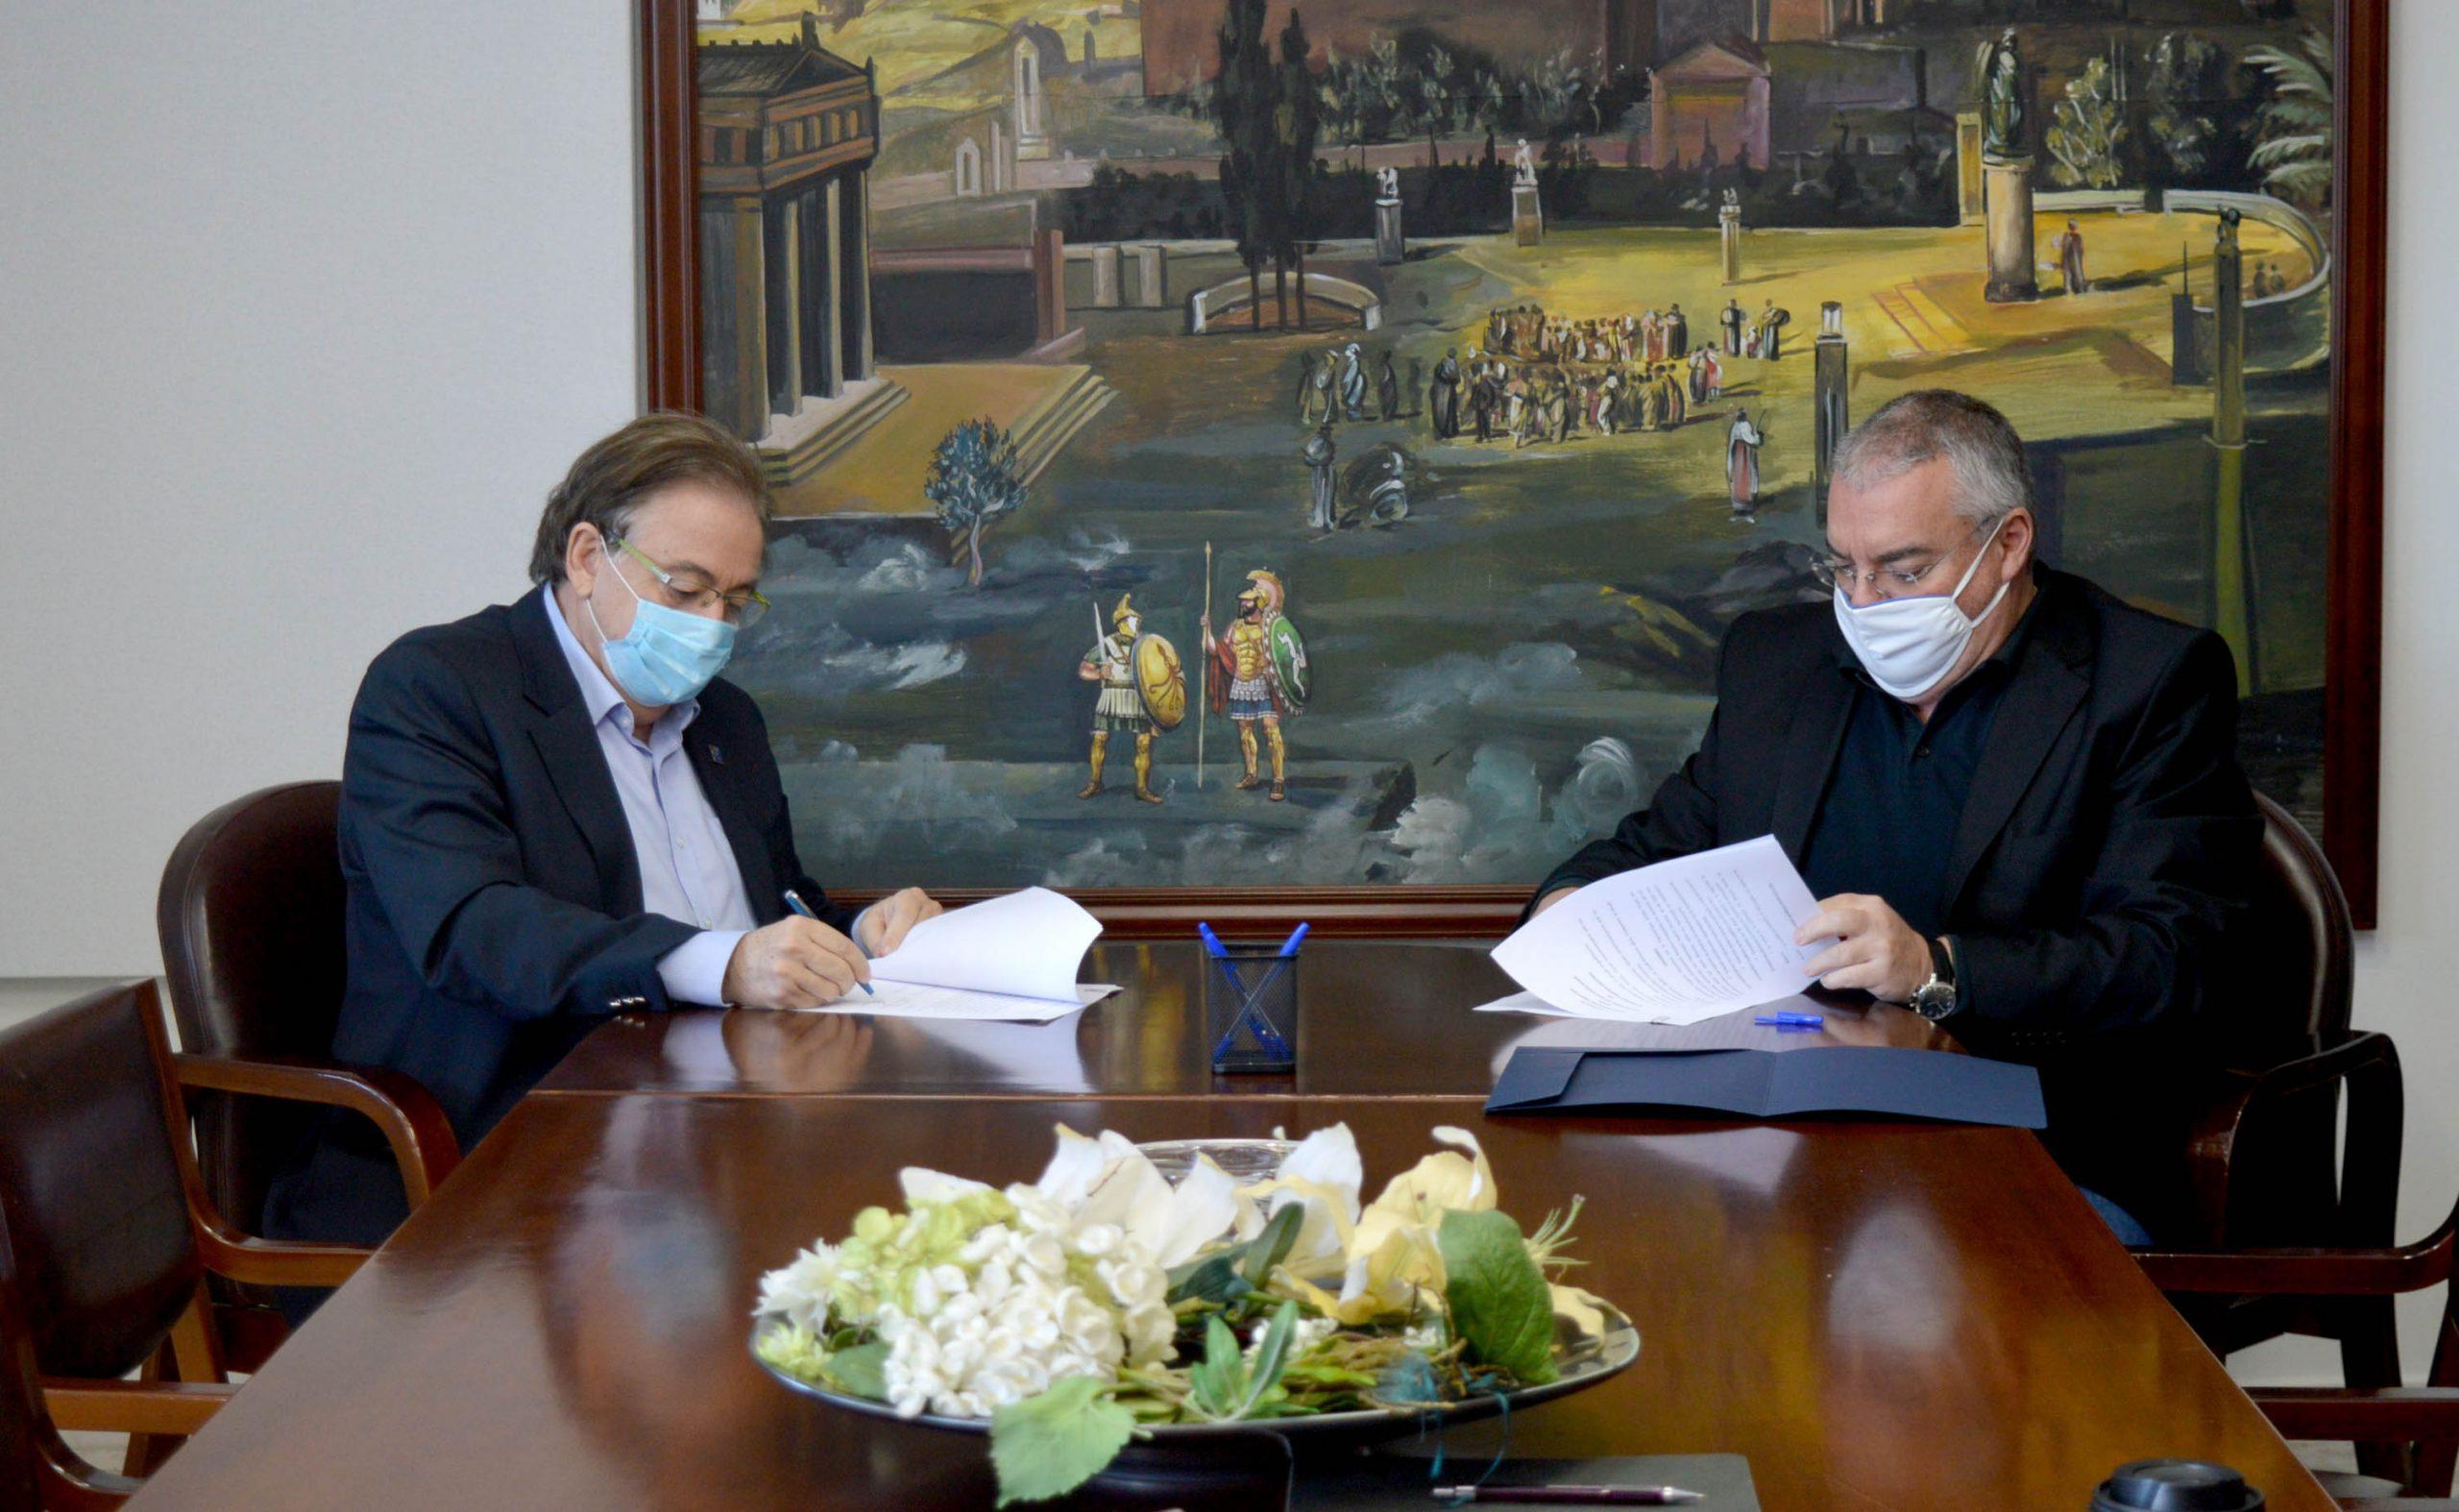 You are currently viewing Μνημόνιο Συνεργασίας μεταξύ του Οργανισμού Λιμένος Ελευσίνας AE και του Πανεπιστημίου Δυτικής Αττικής